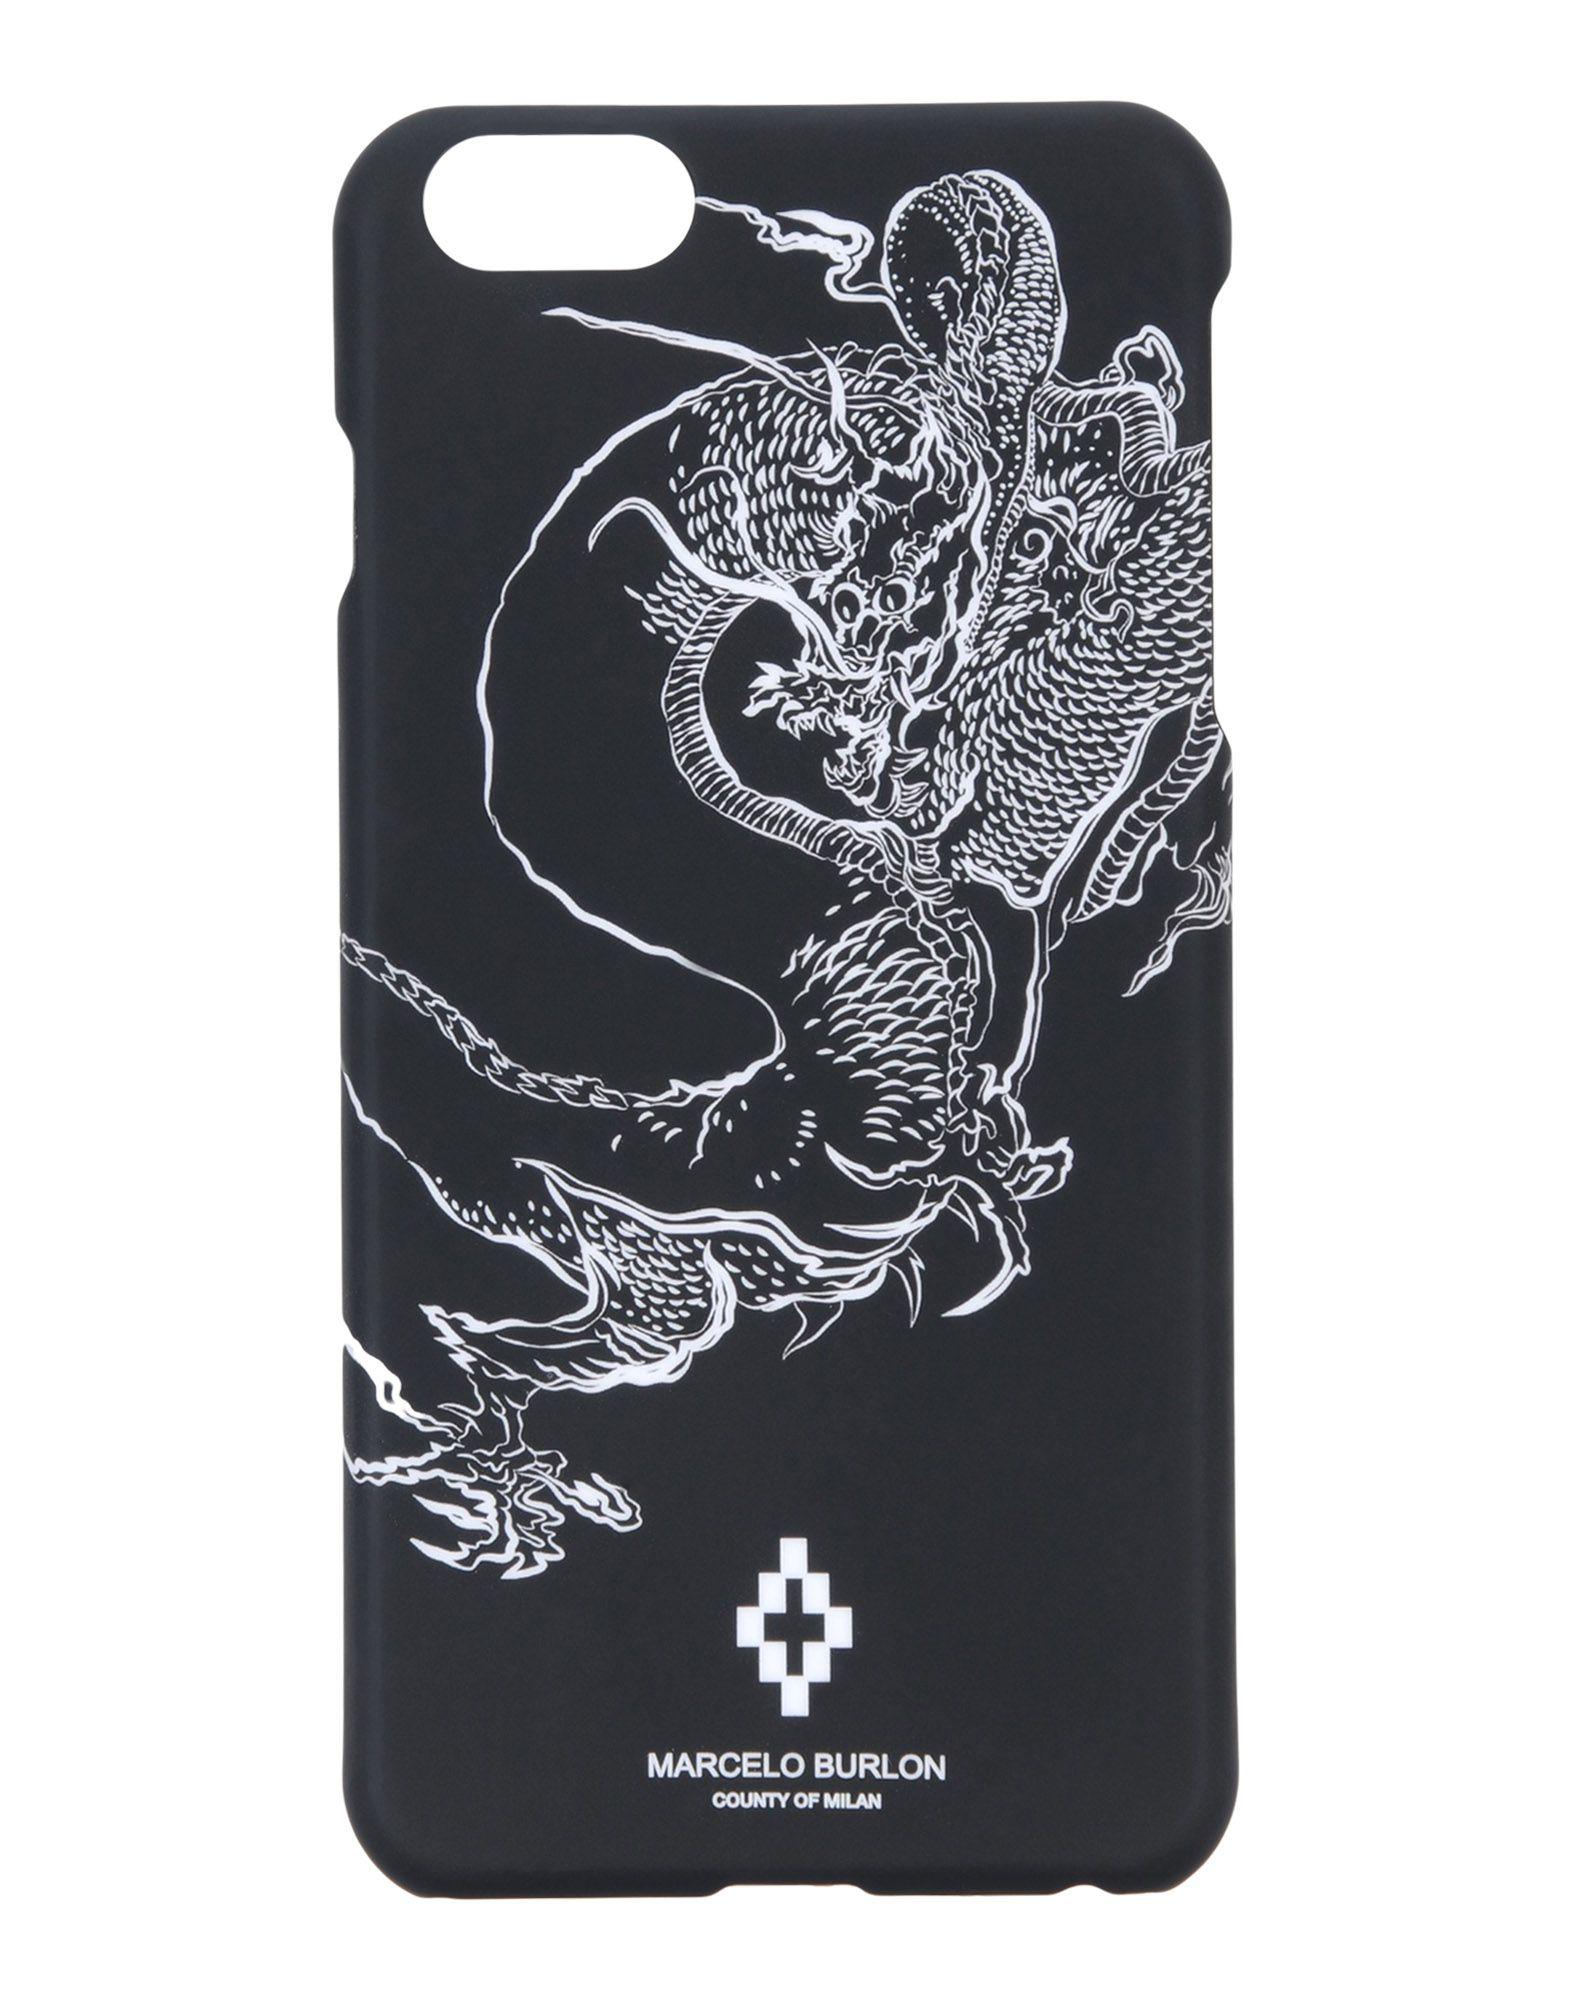 MARCELO BURLON Чехол чехол накладка для iphone 5 5s 6 6s 6plus 6s plus змеиный дизайн